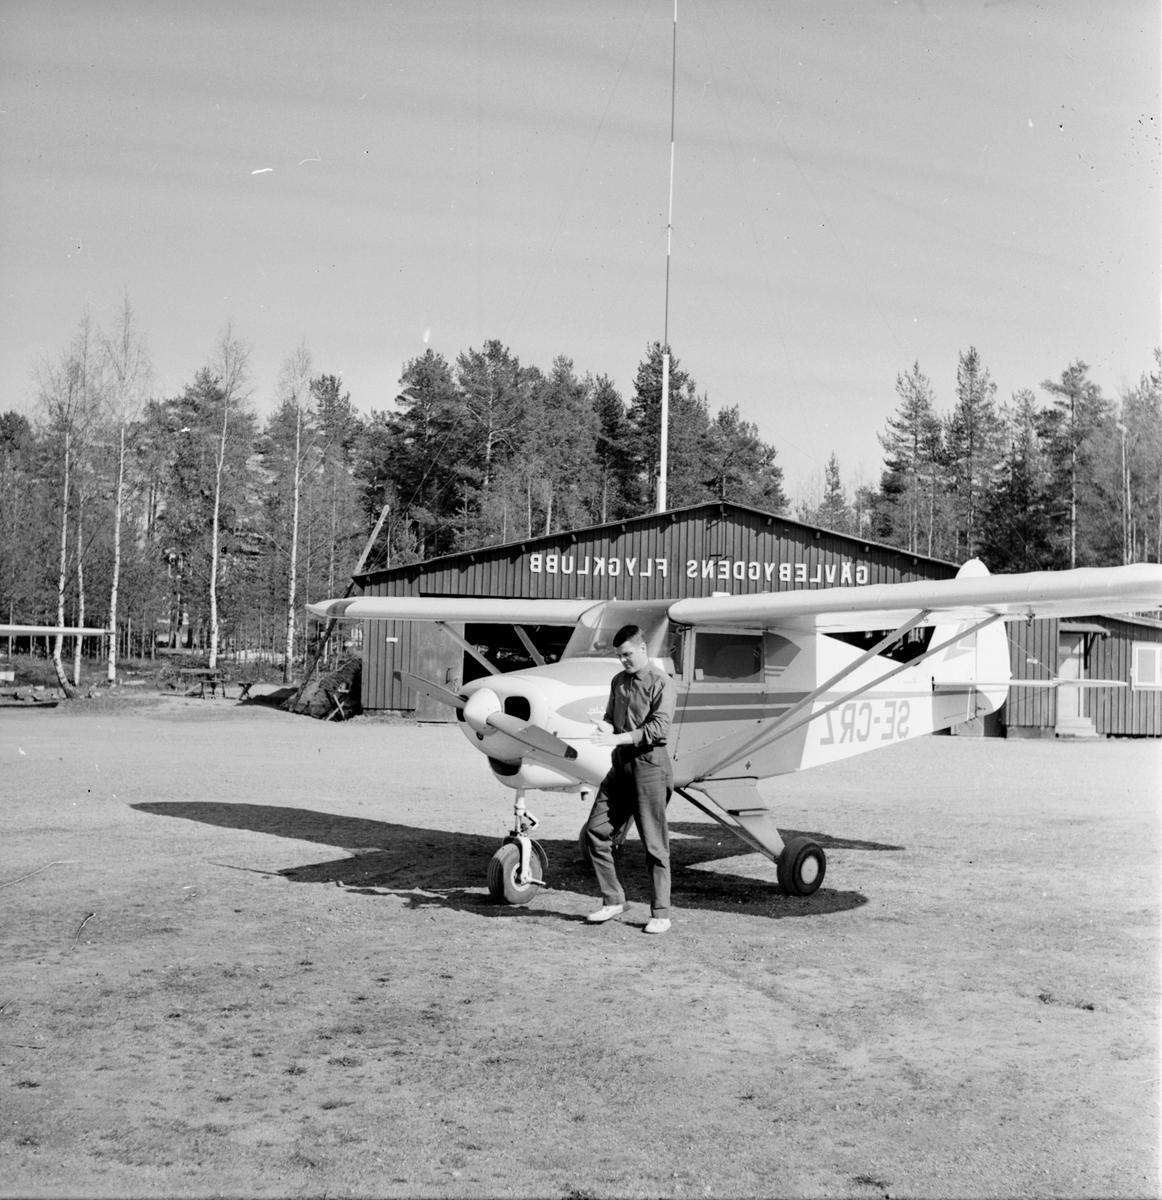 Laurin Roland, Polis,flygare, 17 Maj 1966